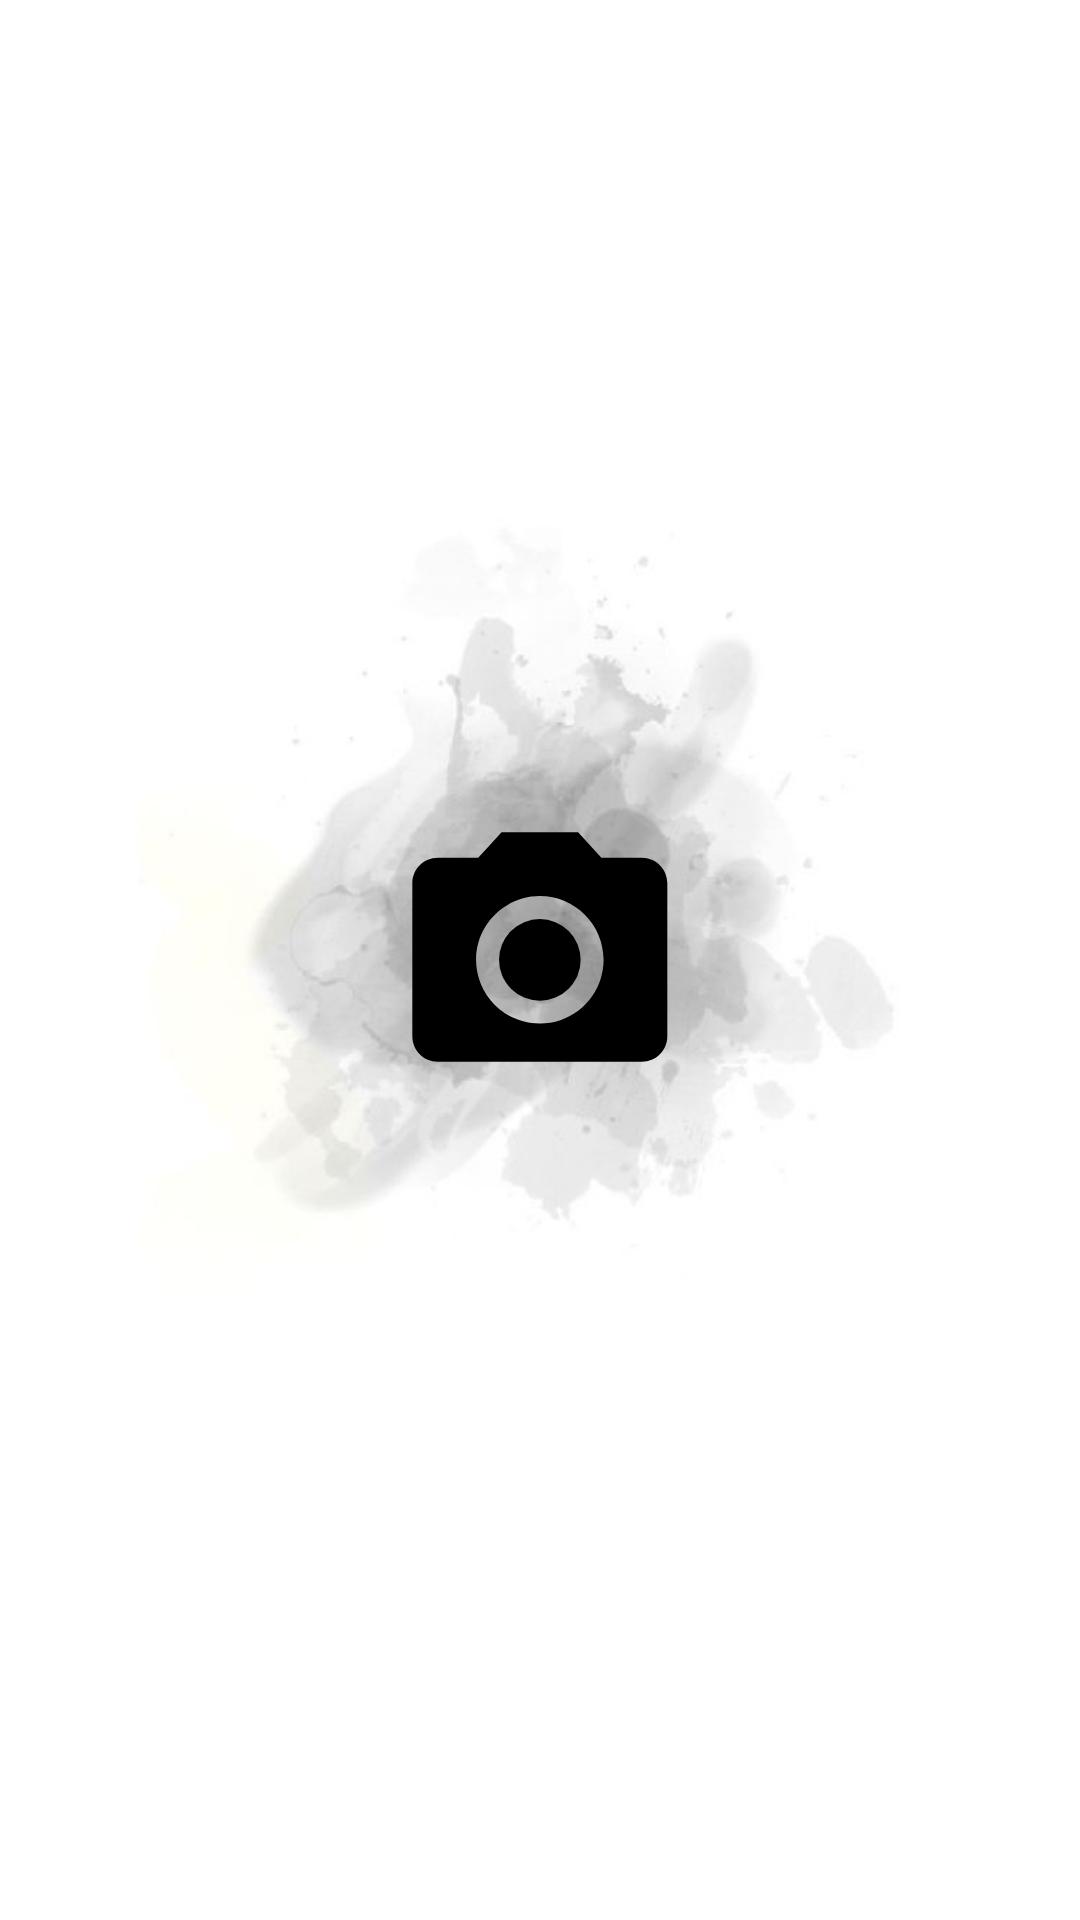 Black and Grey imagens) Ideias instagram, Logotipo